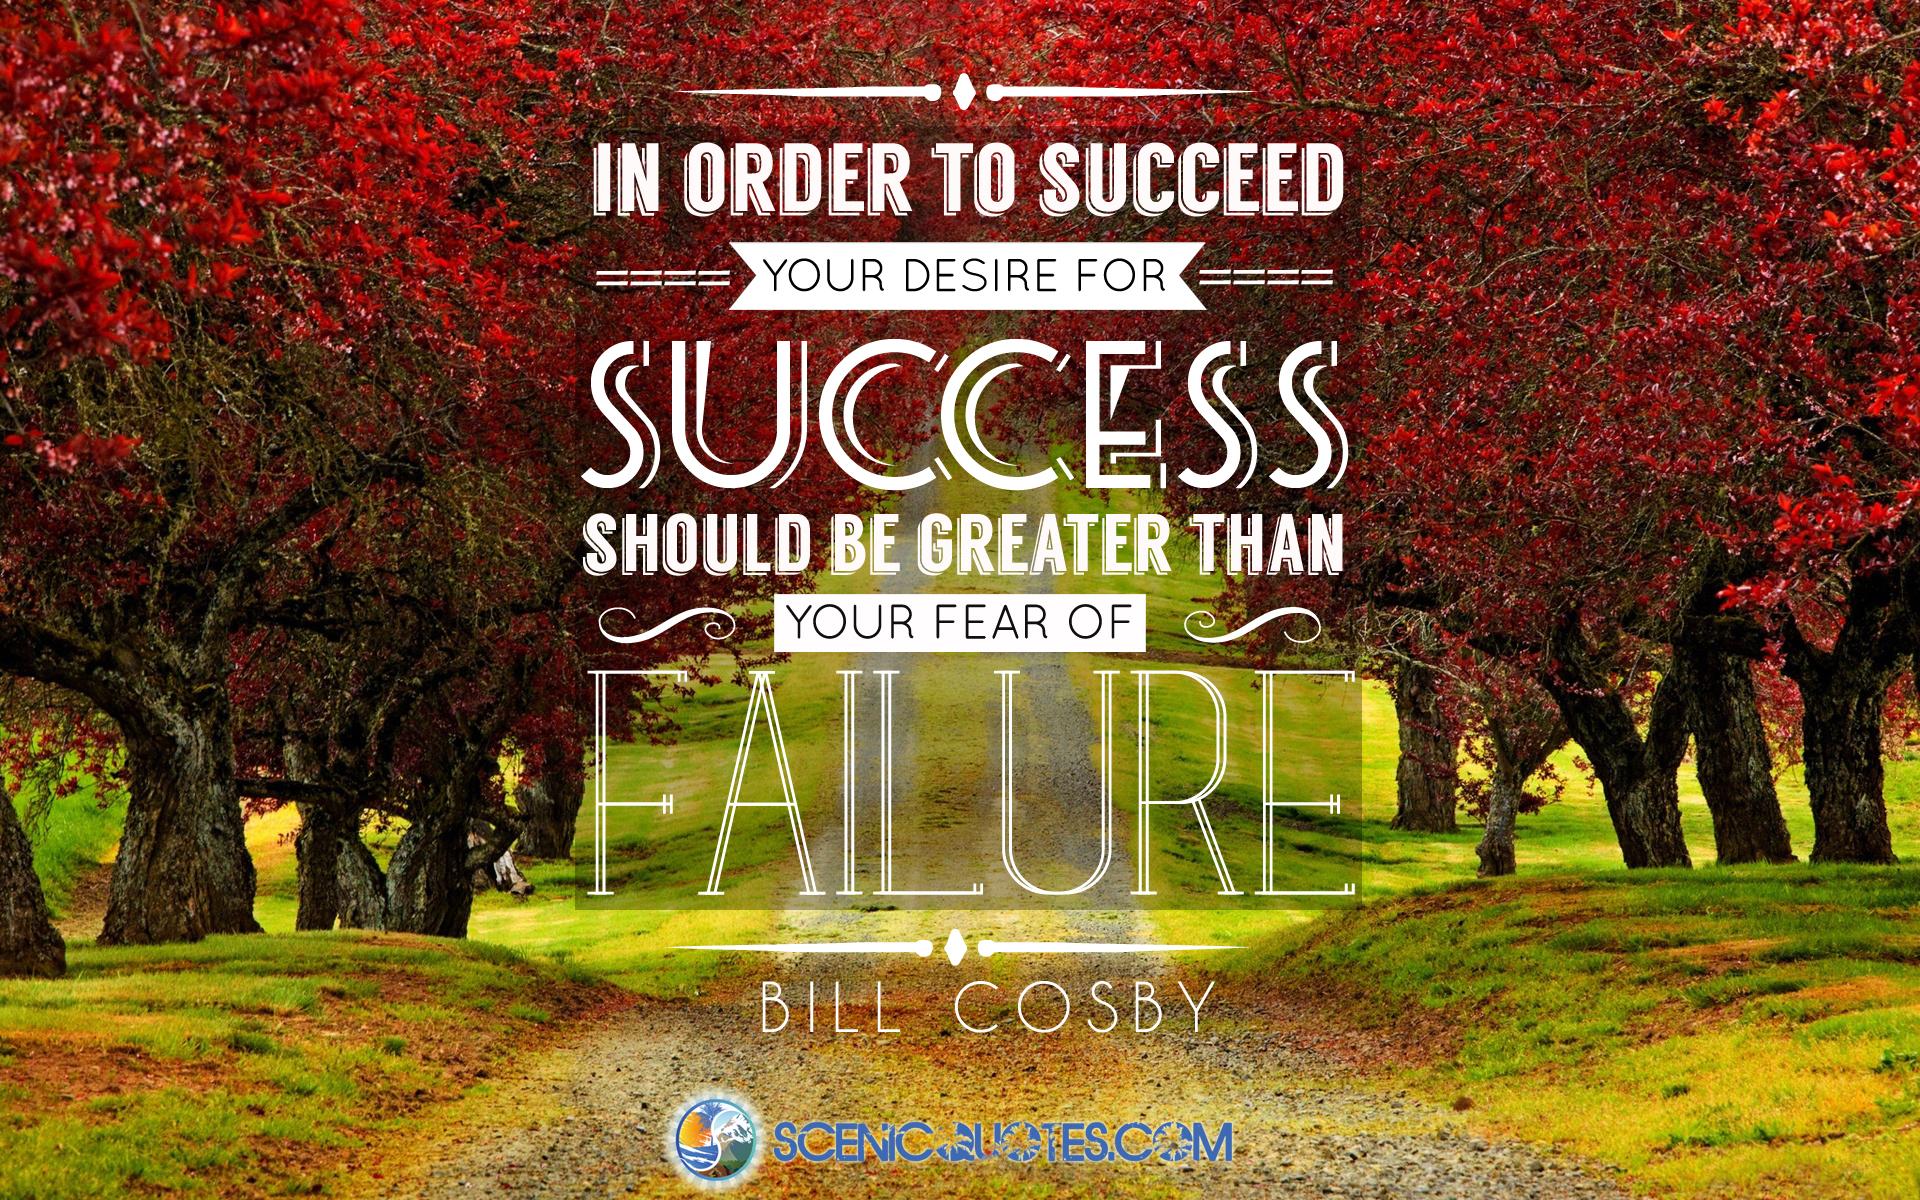 Success quote by scenicquotes.com